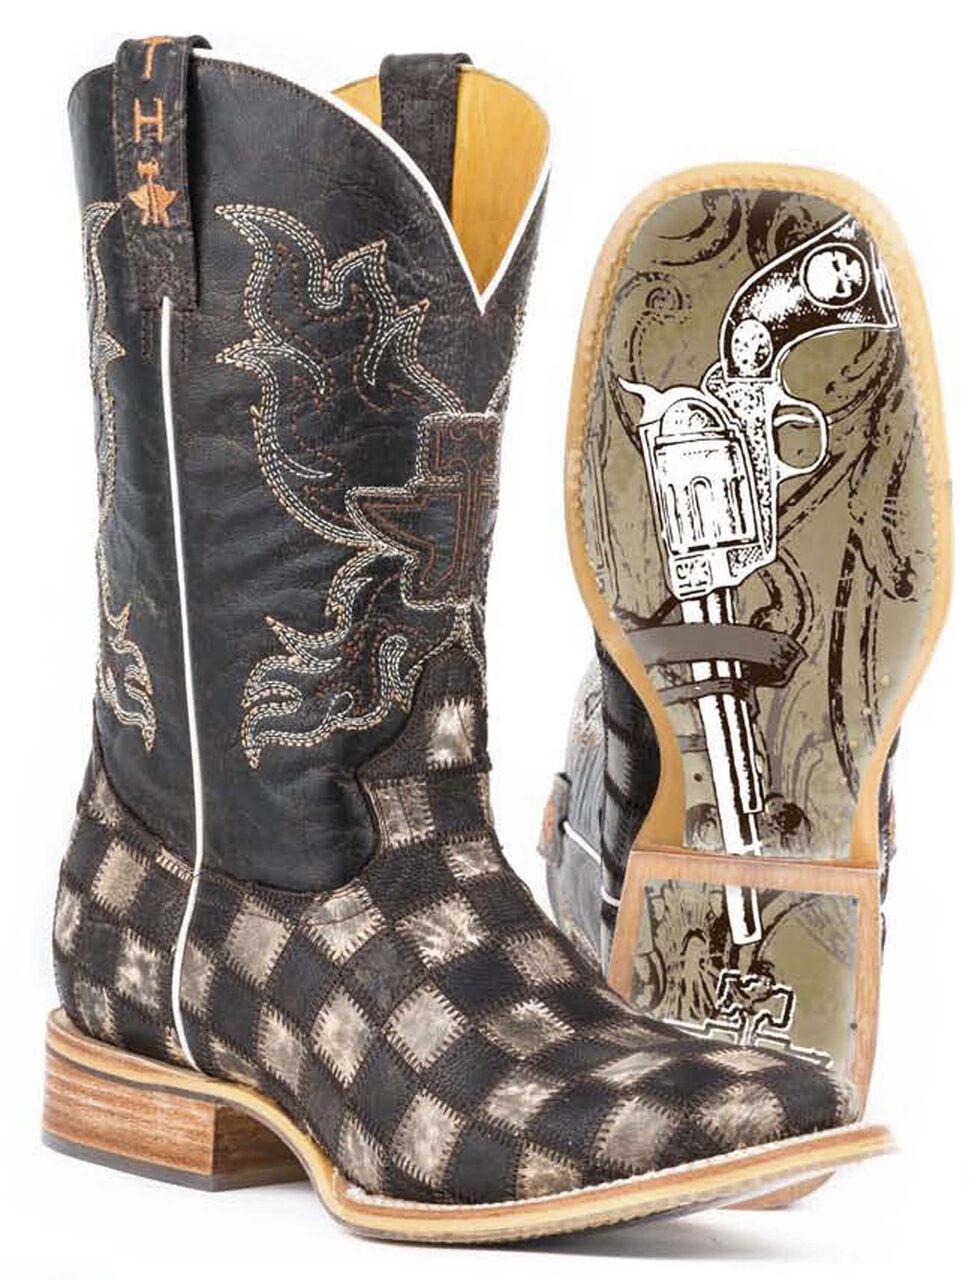 Tin Haul Men's Gunslinger Checkered Cowboy Boots - Square Toe, Brown, hi-res